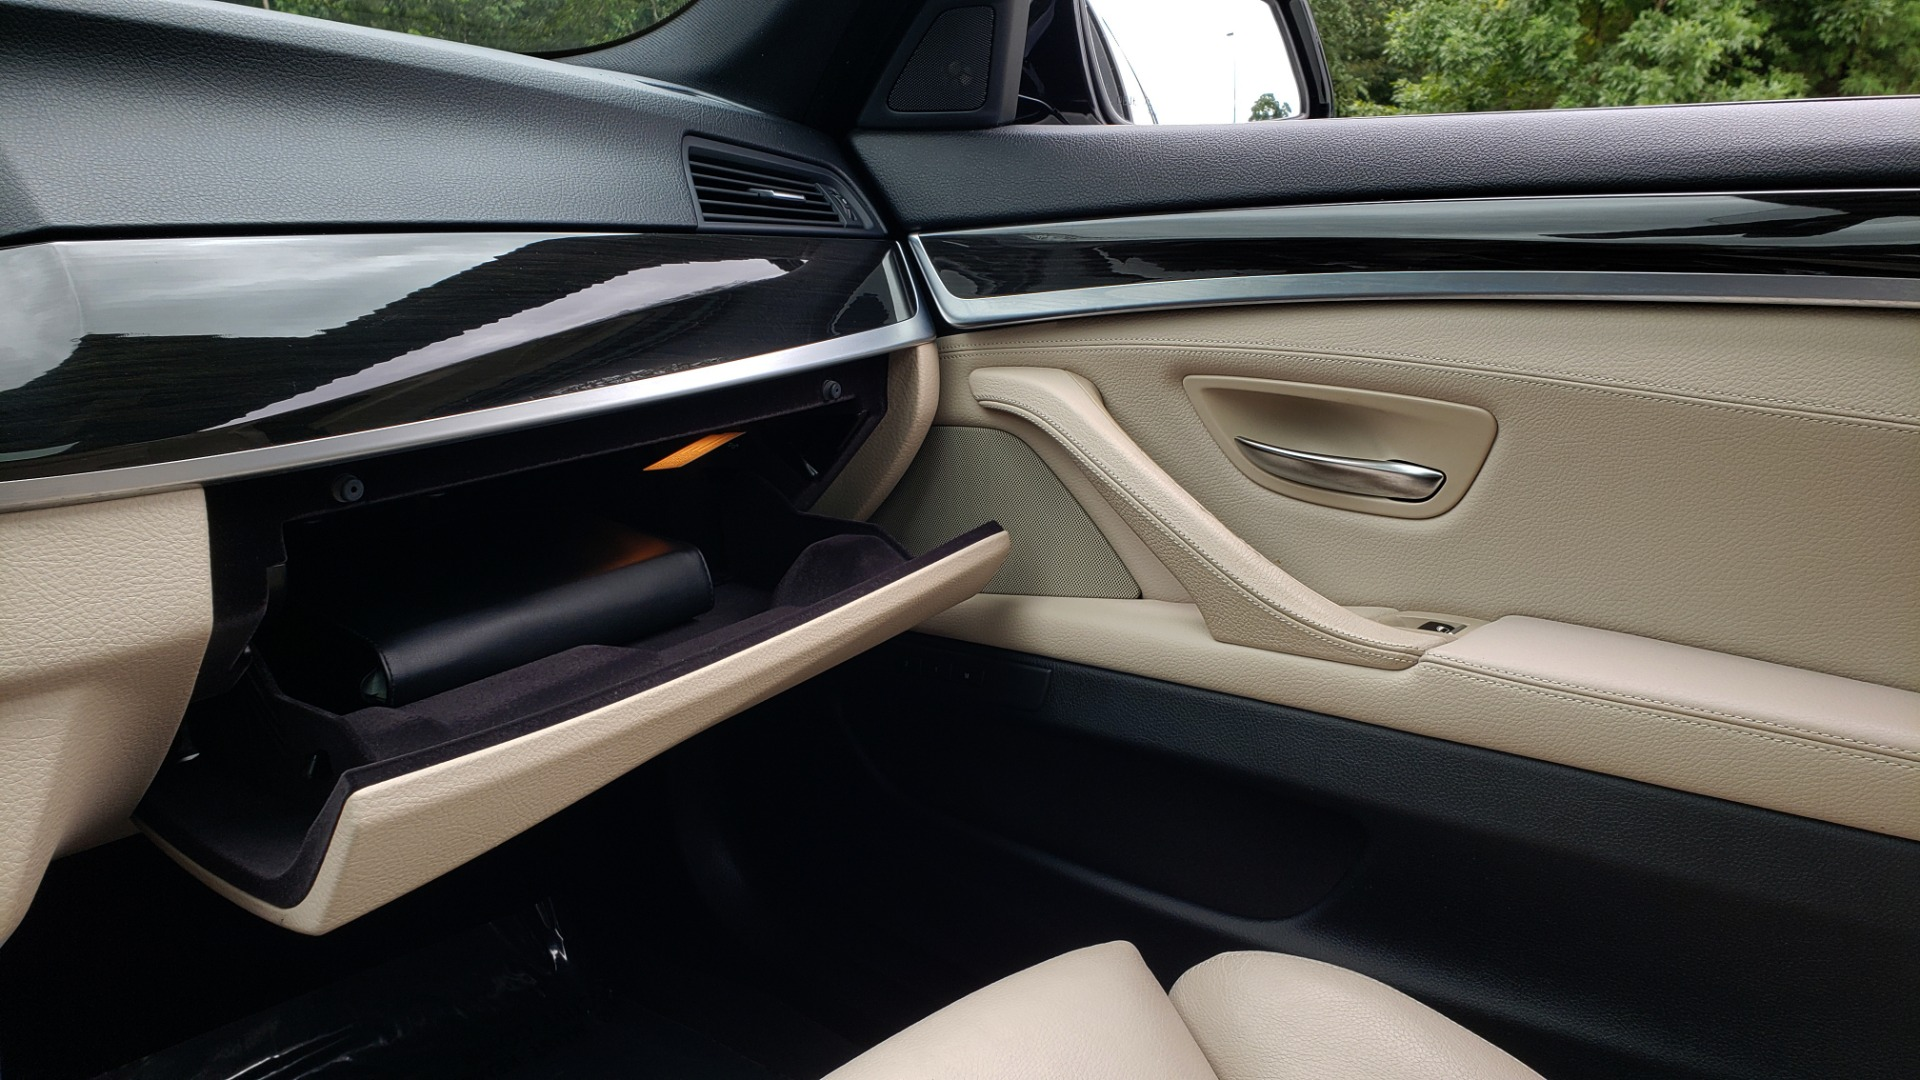 Used 2012 BMW 5 SERIES 550I M SPORT / NAV / CONV PKG / SUNROOF / PREM SND / REARVIEW for sale Sold at Formula Imports in Charlotte NC 28227 46